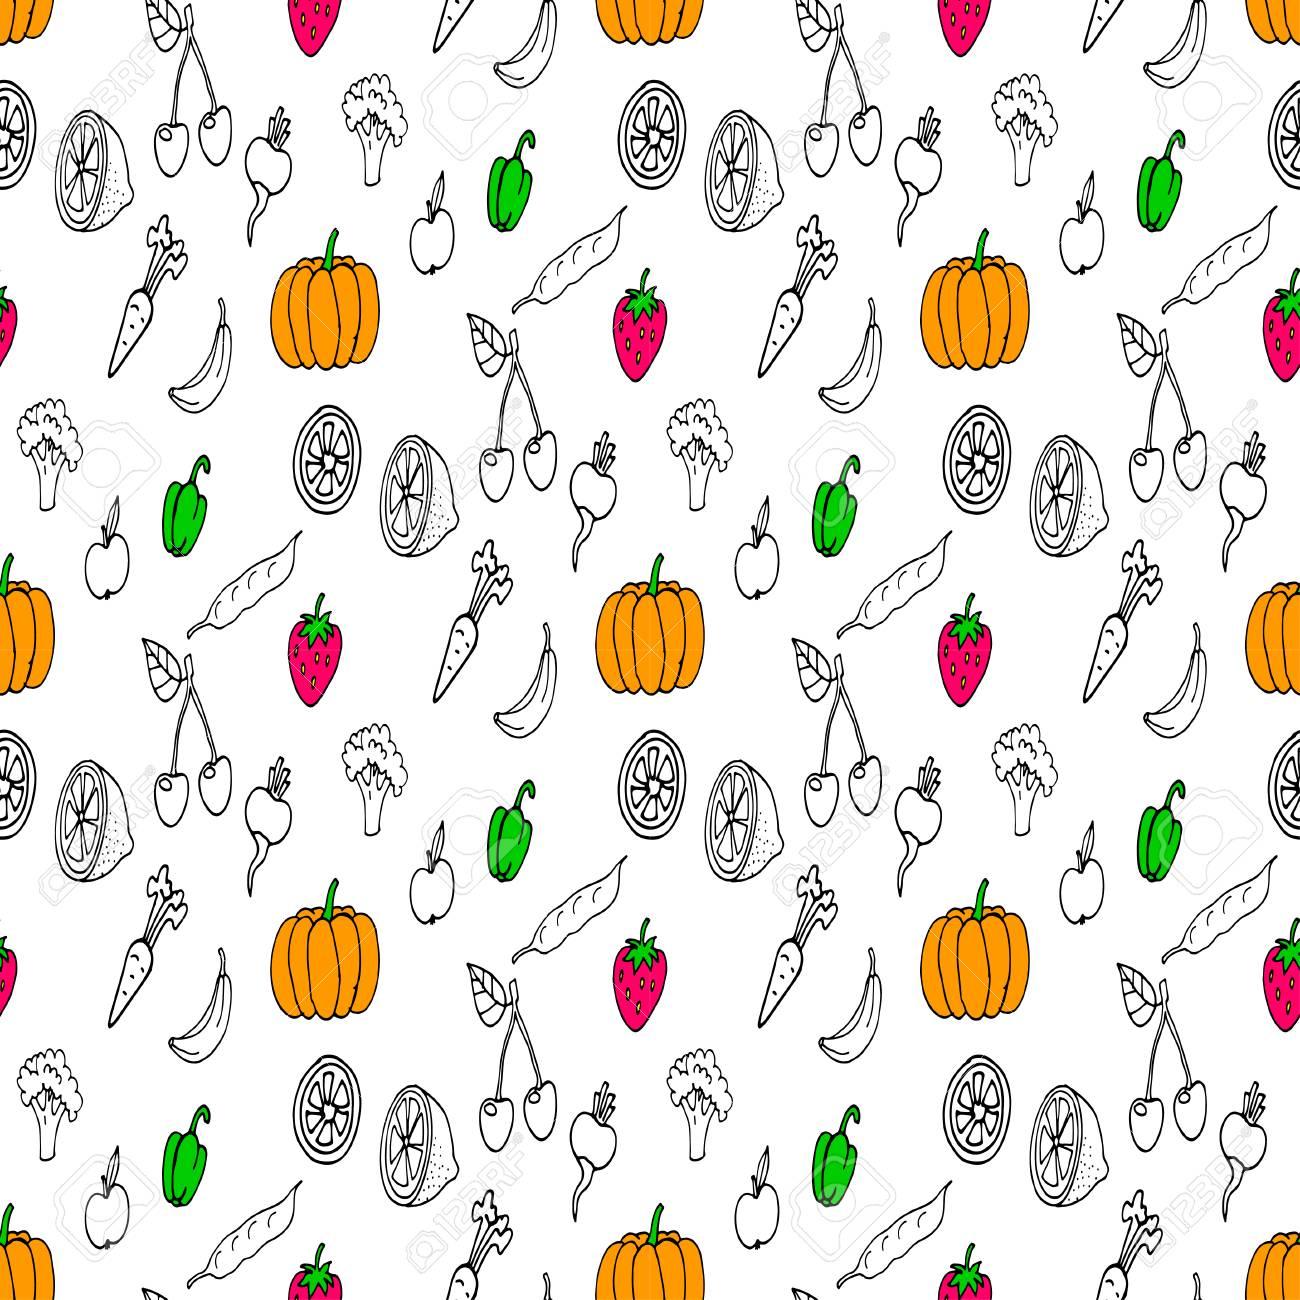 Doodles seamless pattern - 69017548